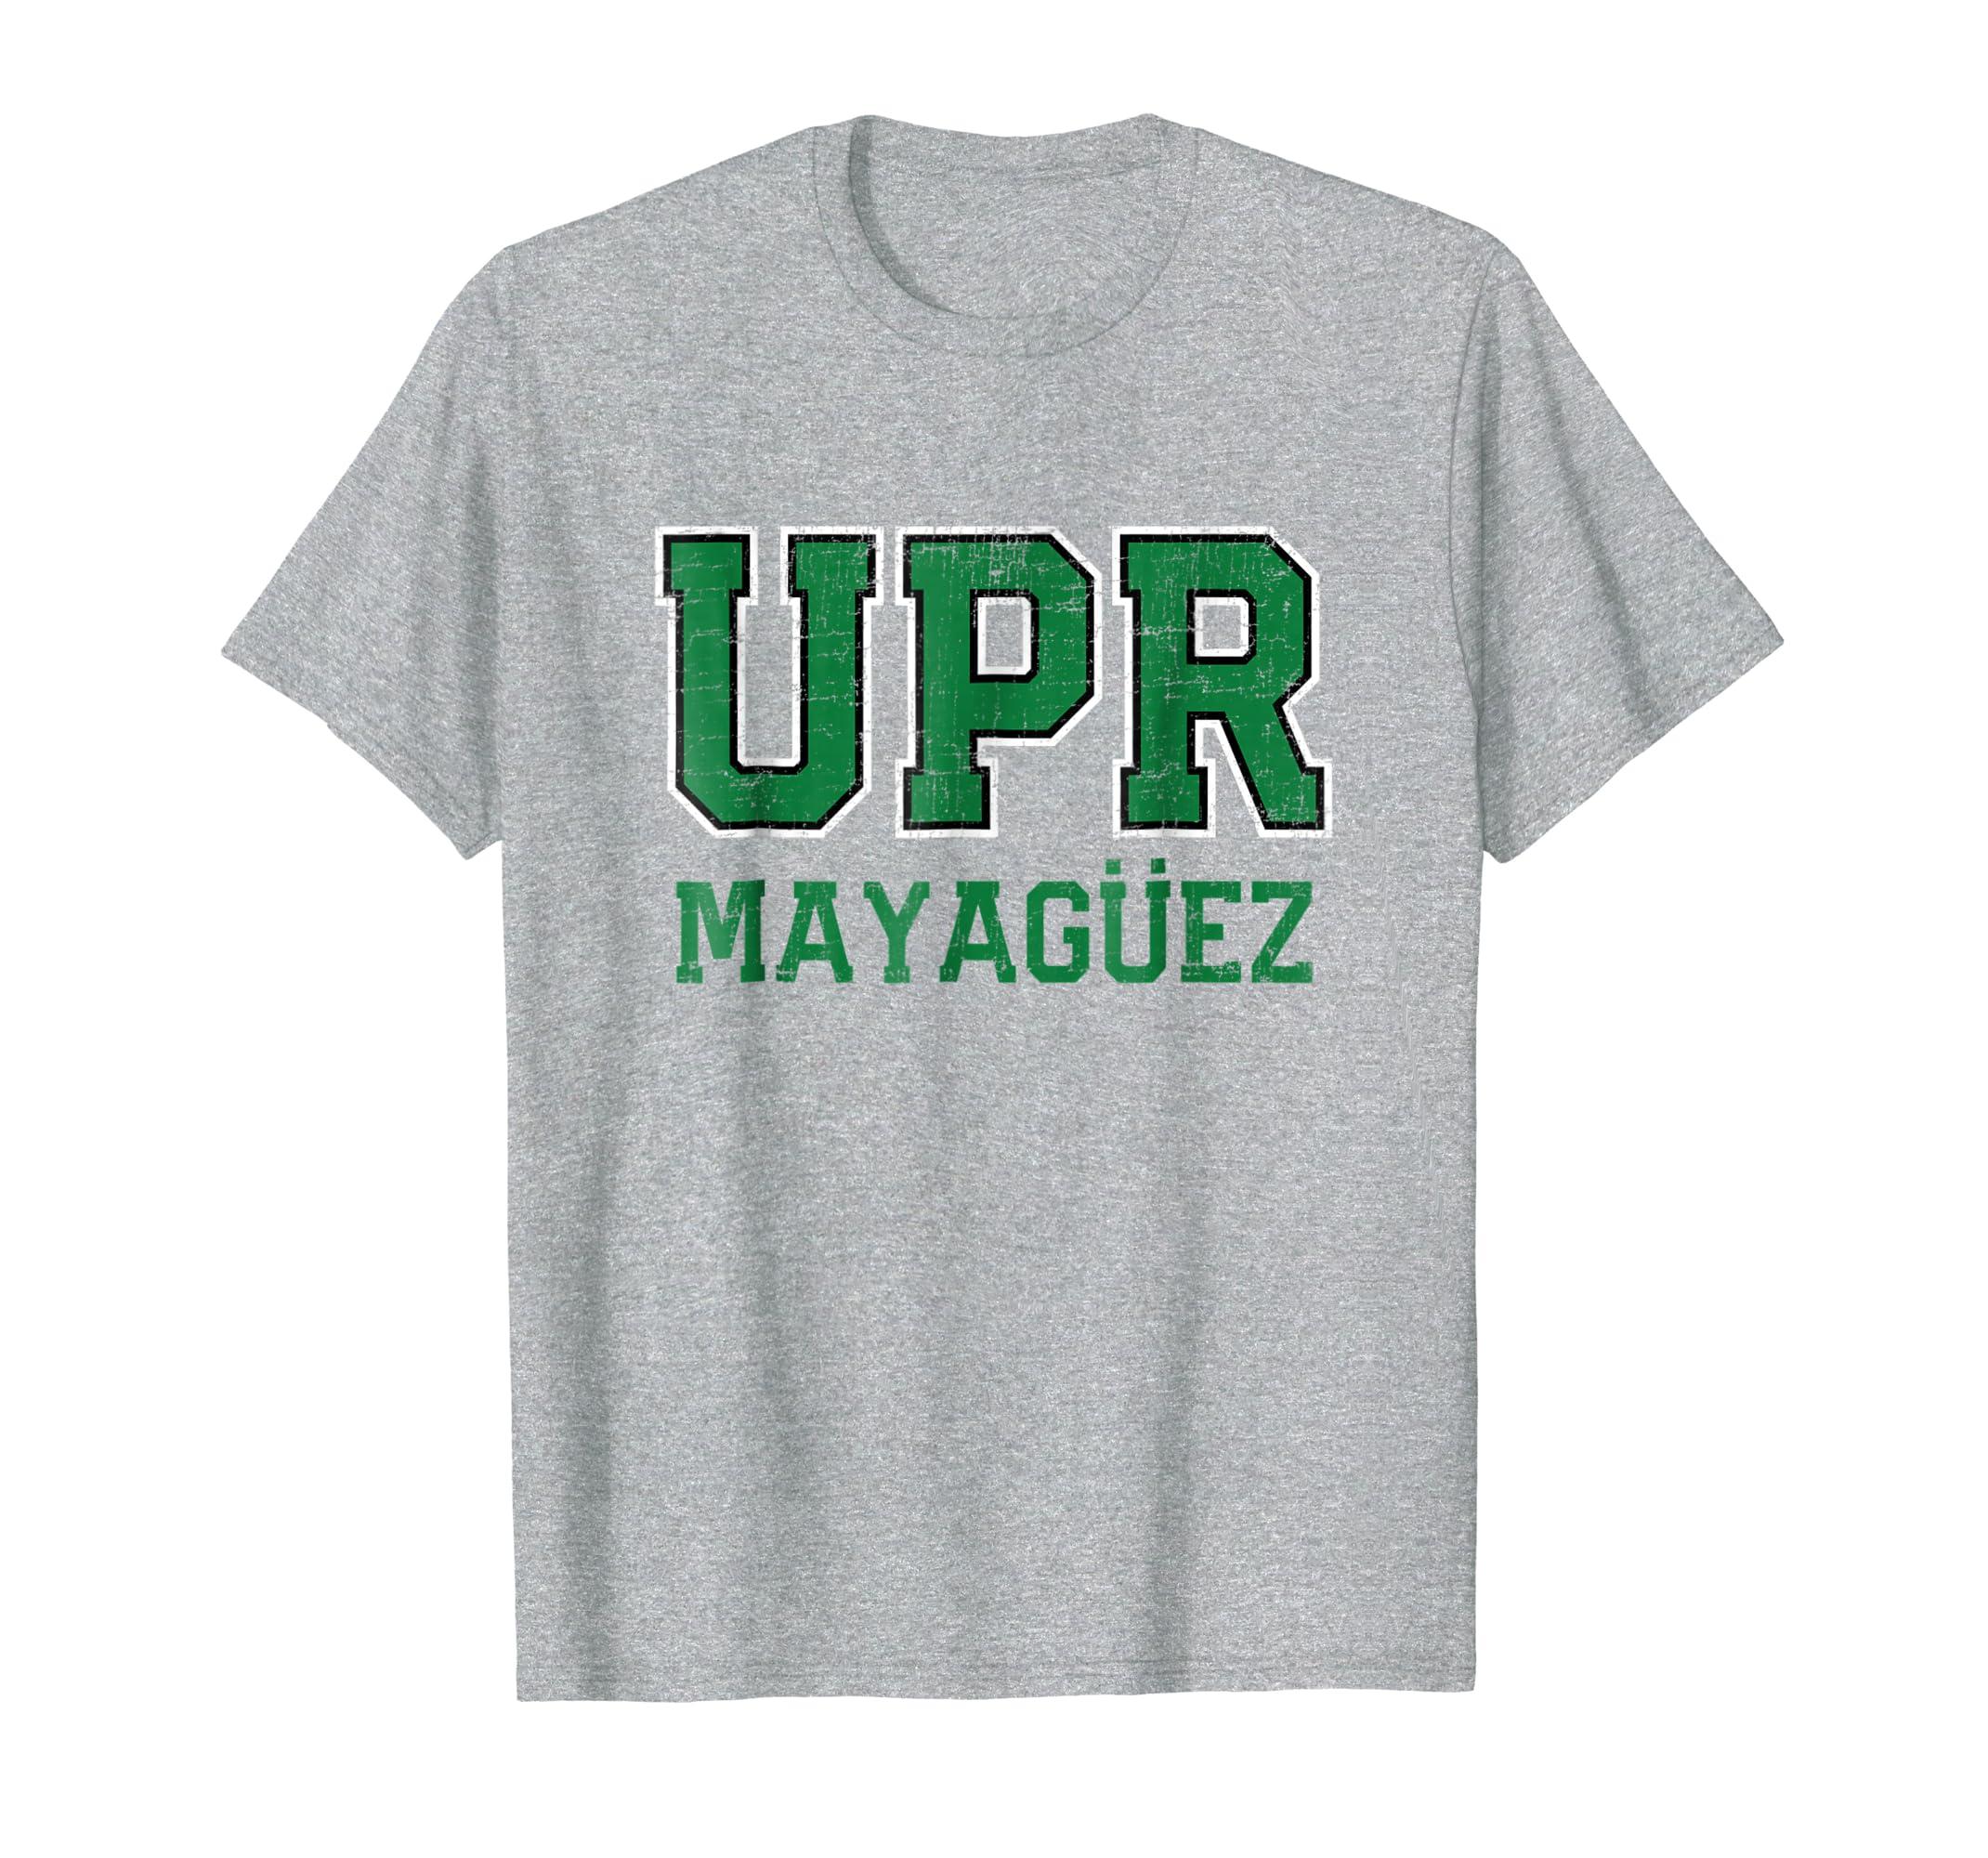 Amazon.com: Universidad de Puerto Rico Colegio Mayaguez UPR T-Shirt: Clothing